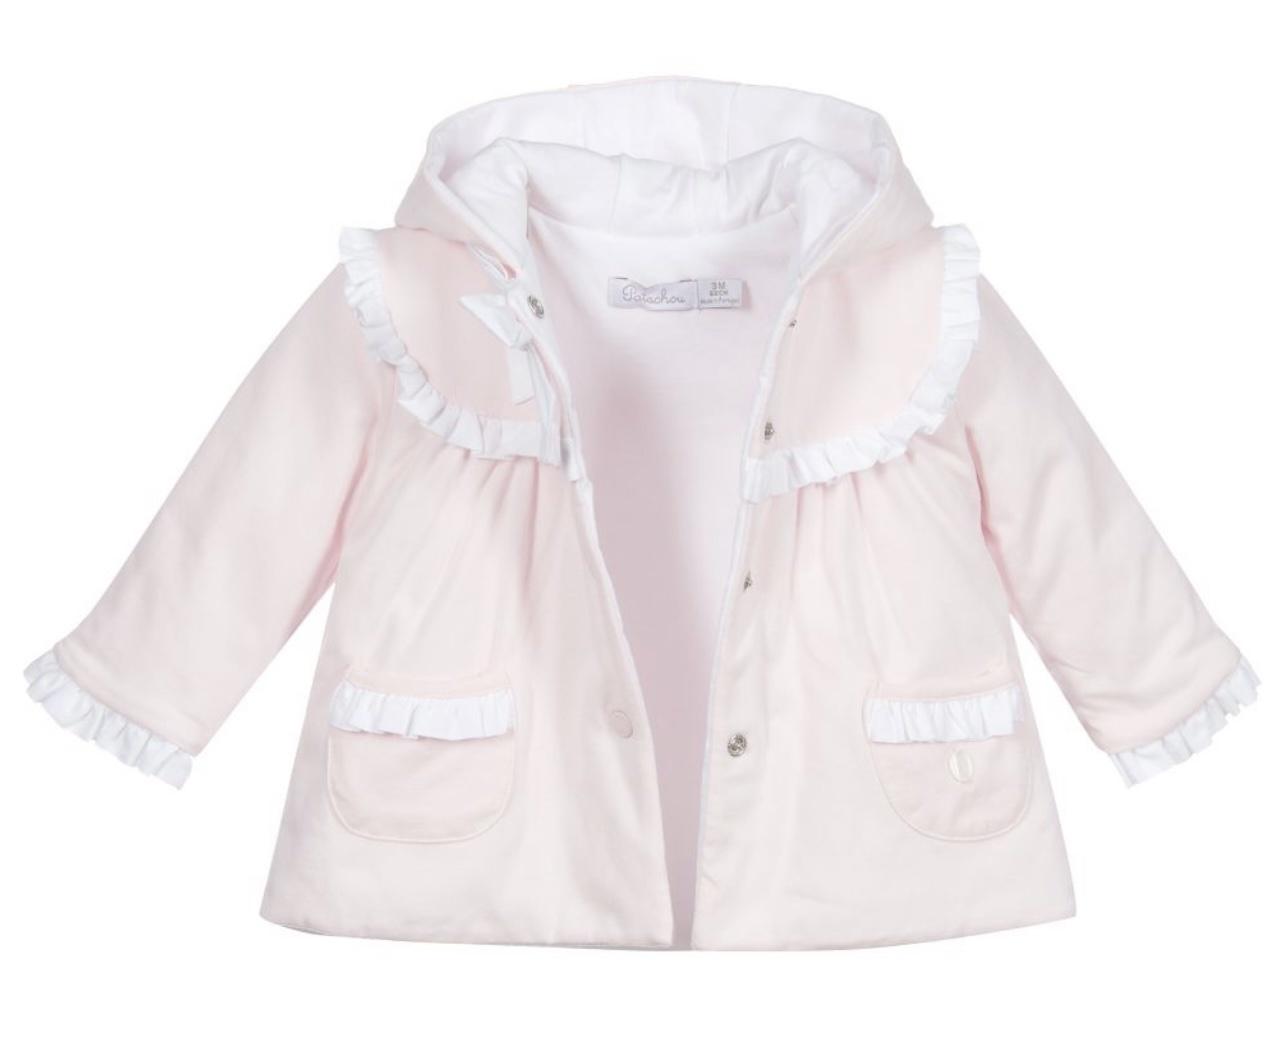 Patachou Patachou - Baby Girls Jersey Knit Jacket 3053 S21